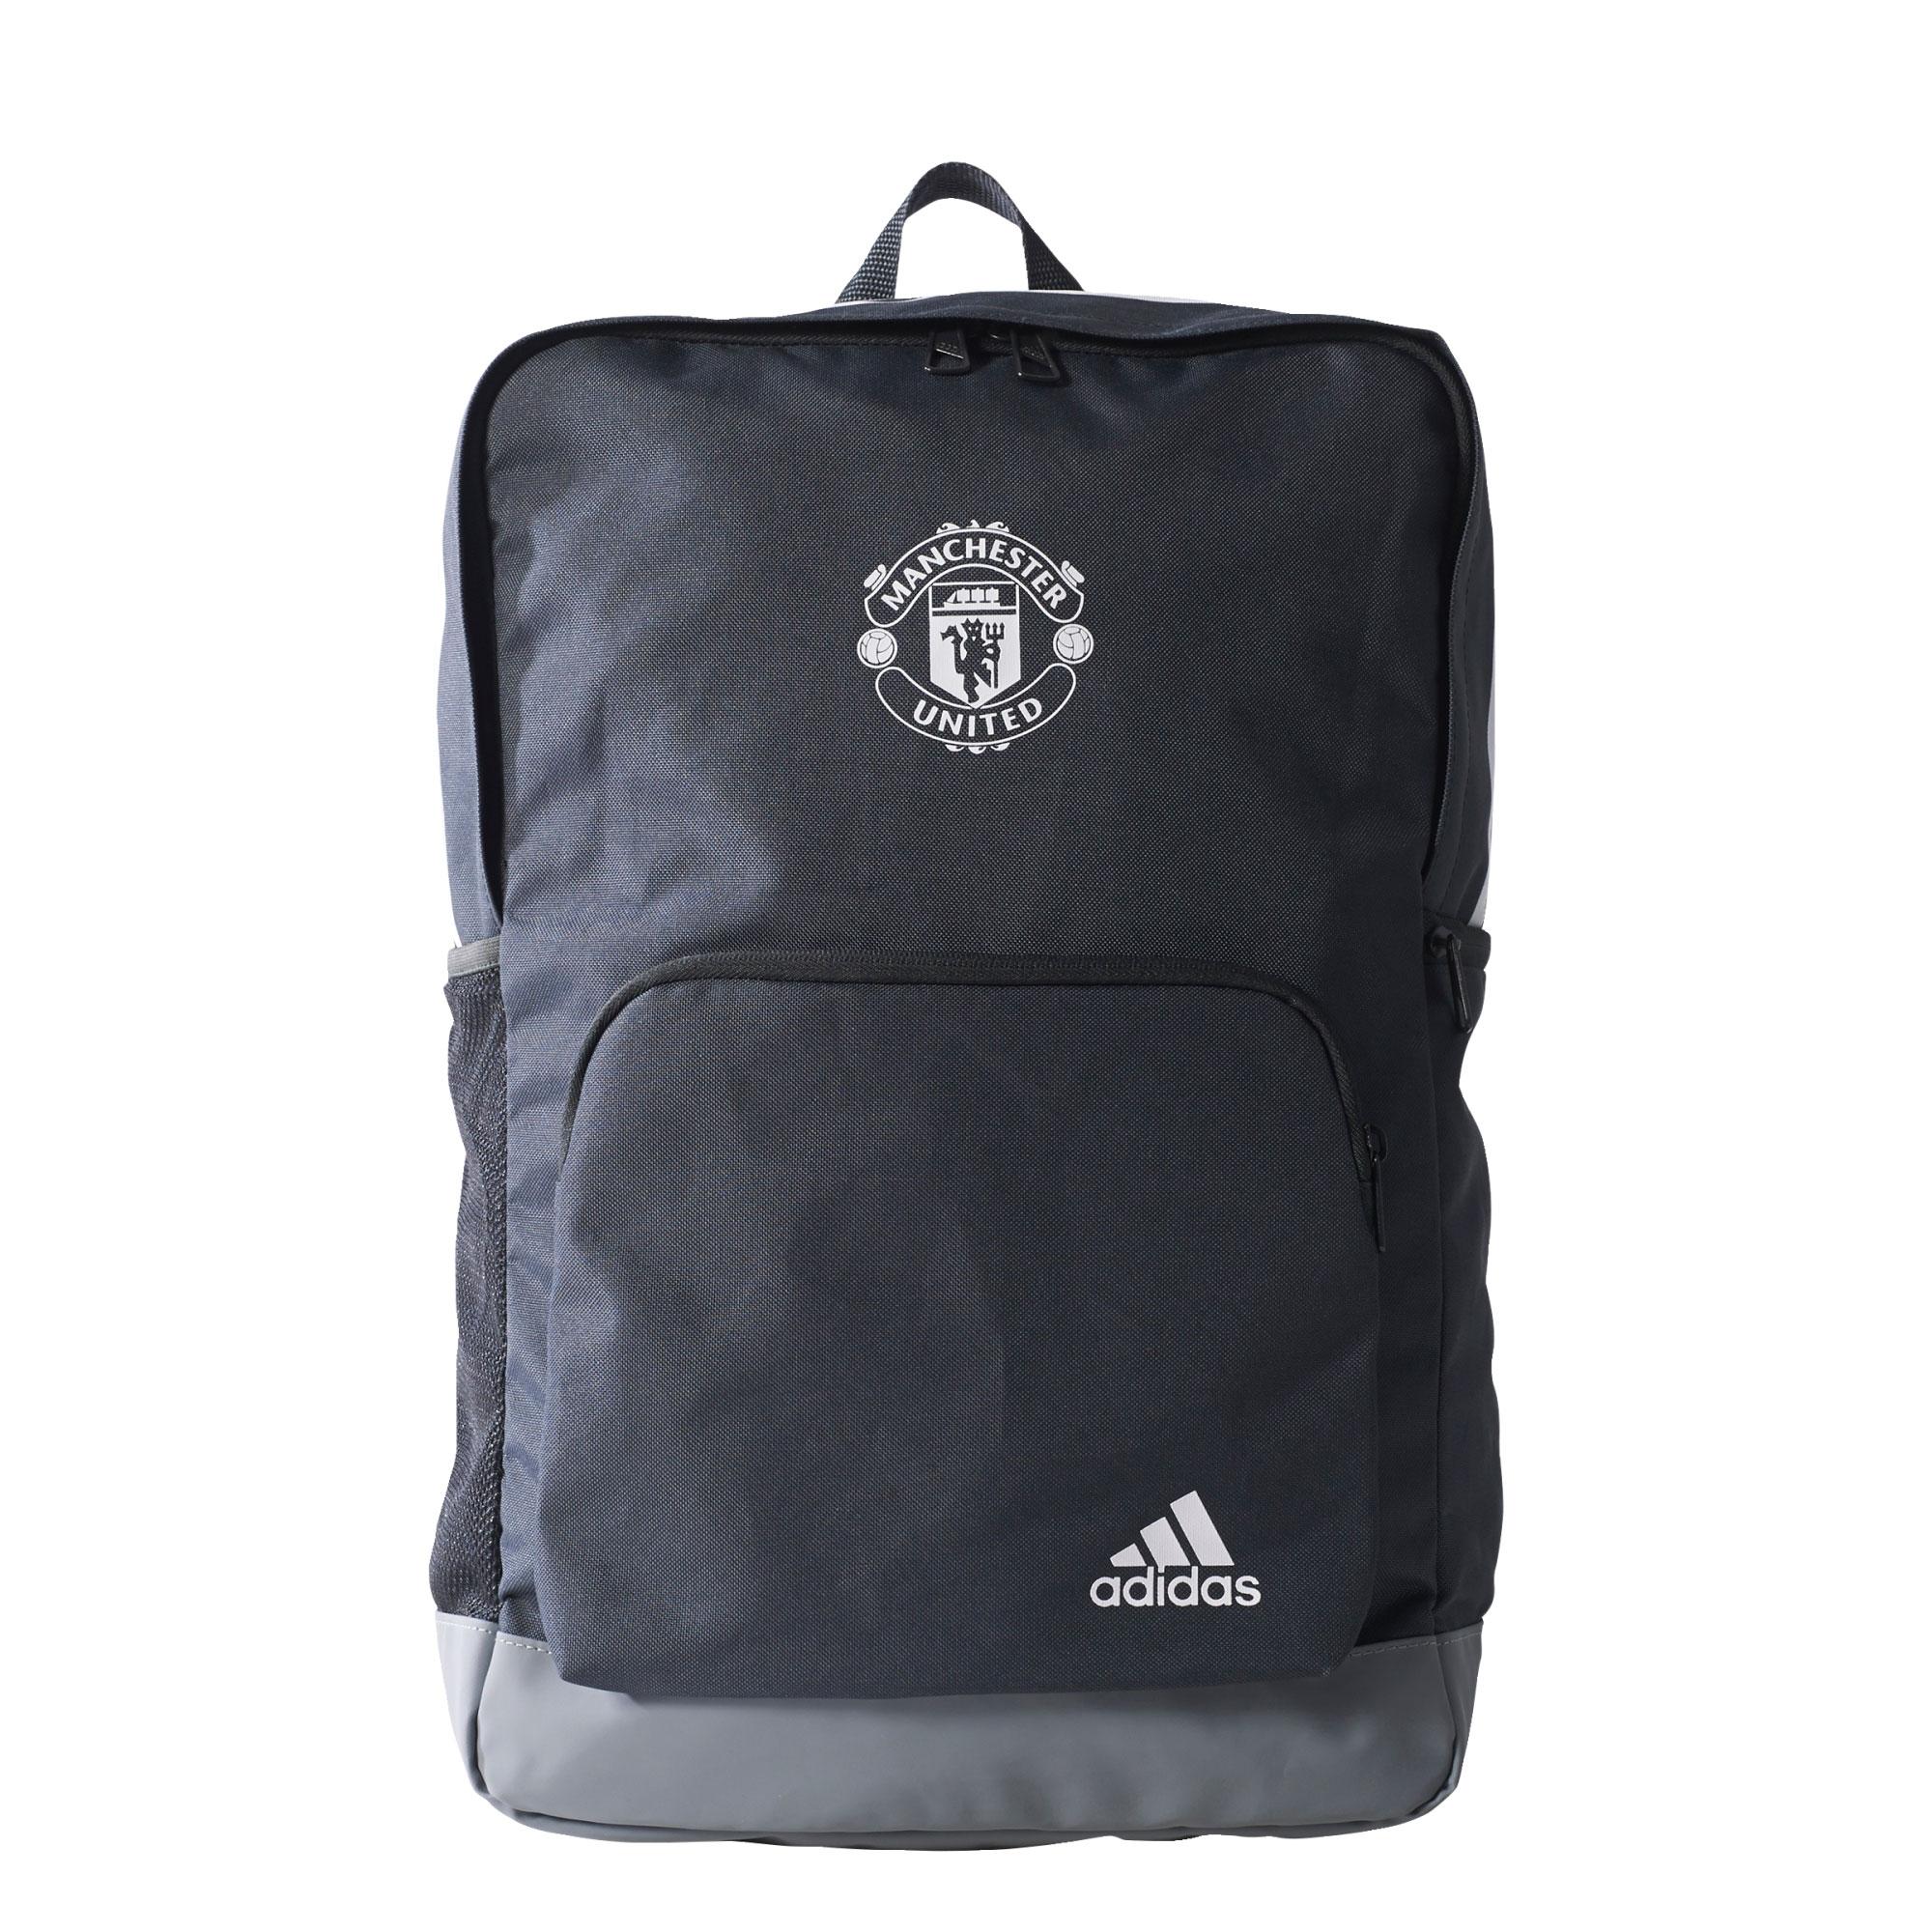 Manchester United Backpack - Dark Grey